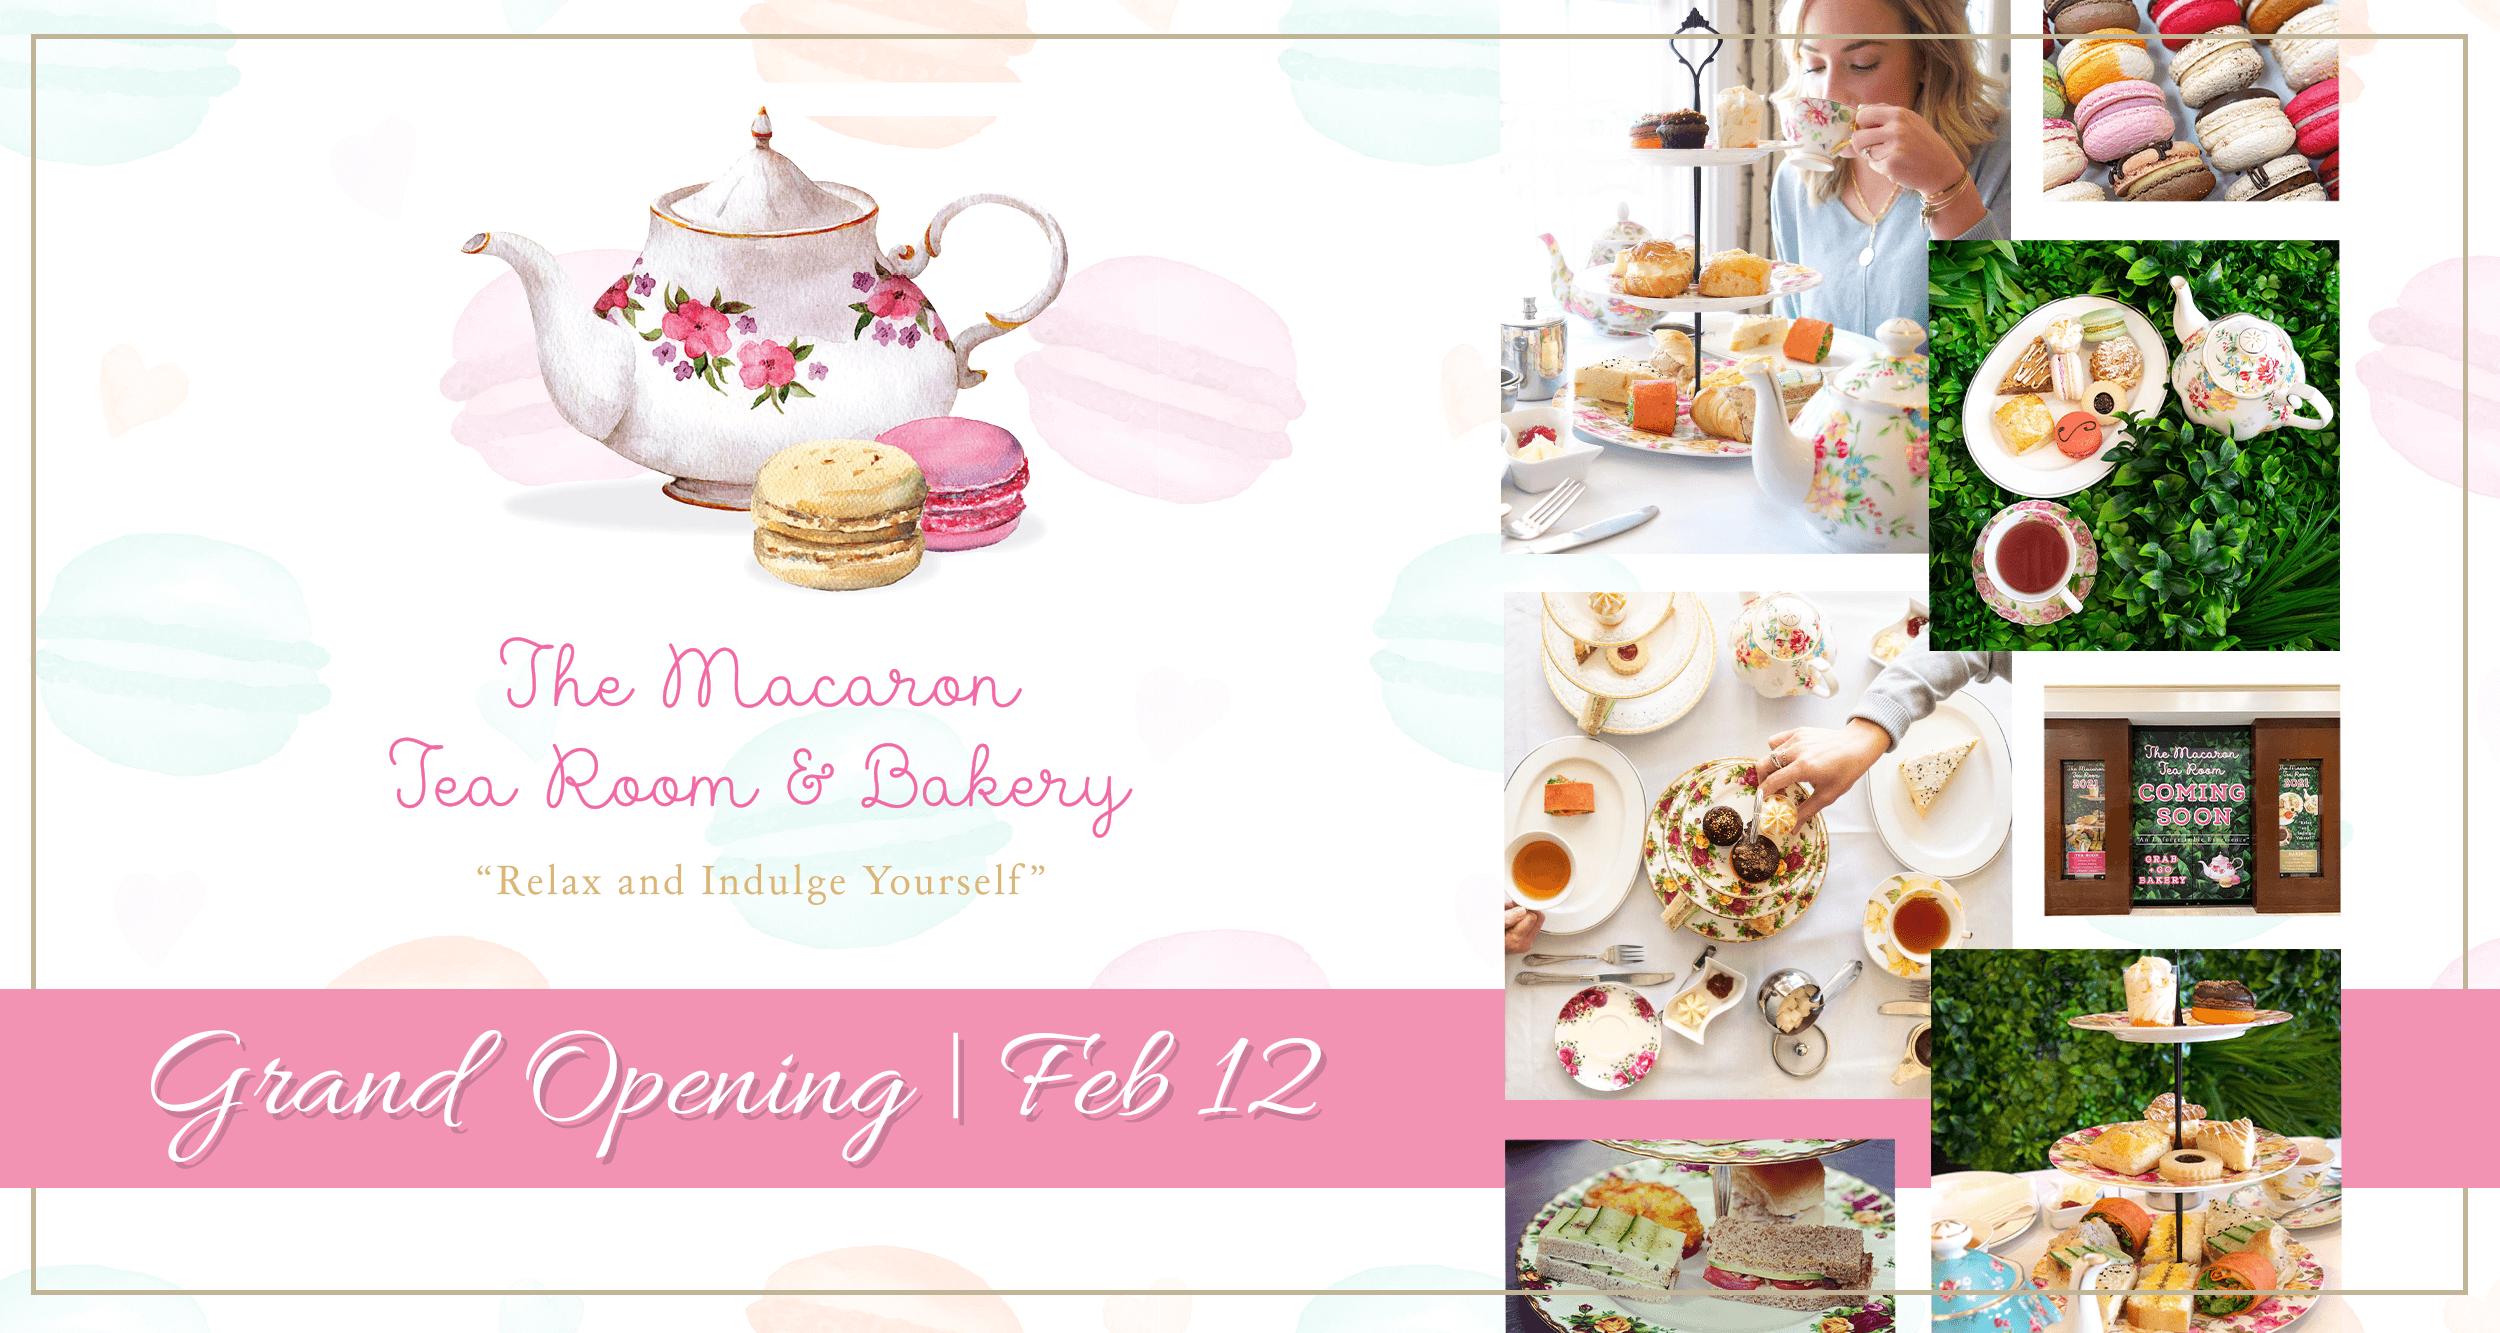 The Macaron Tea Room Grand Opening